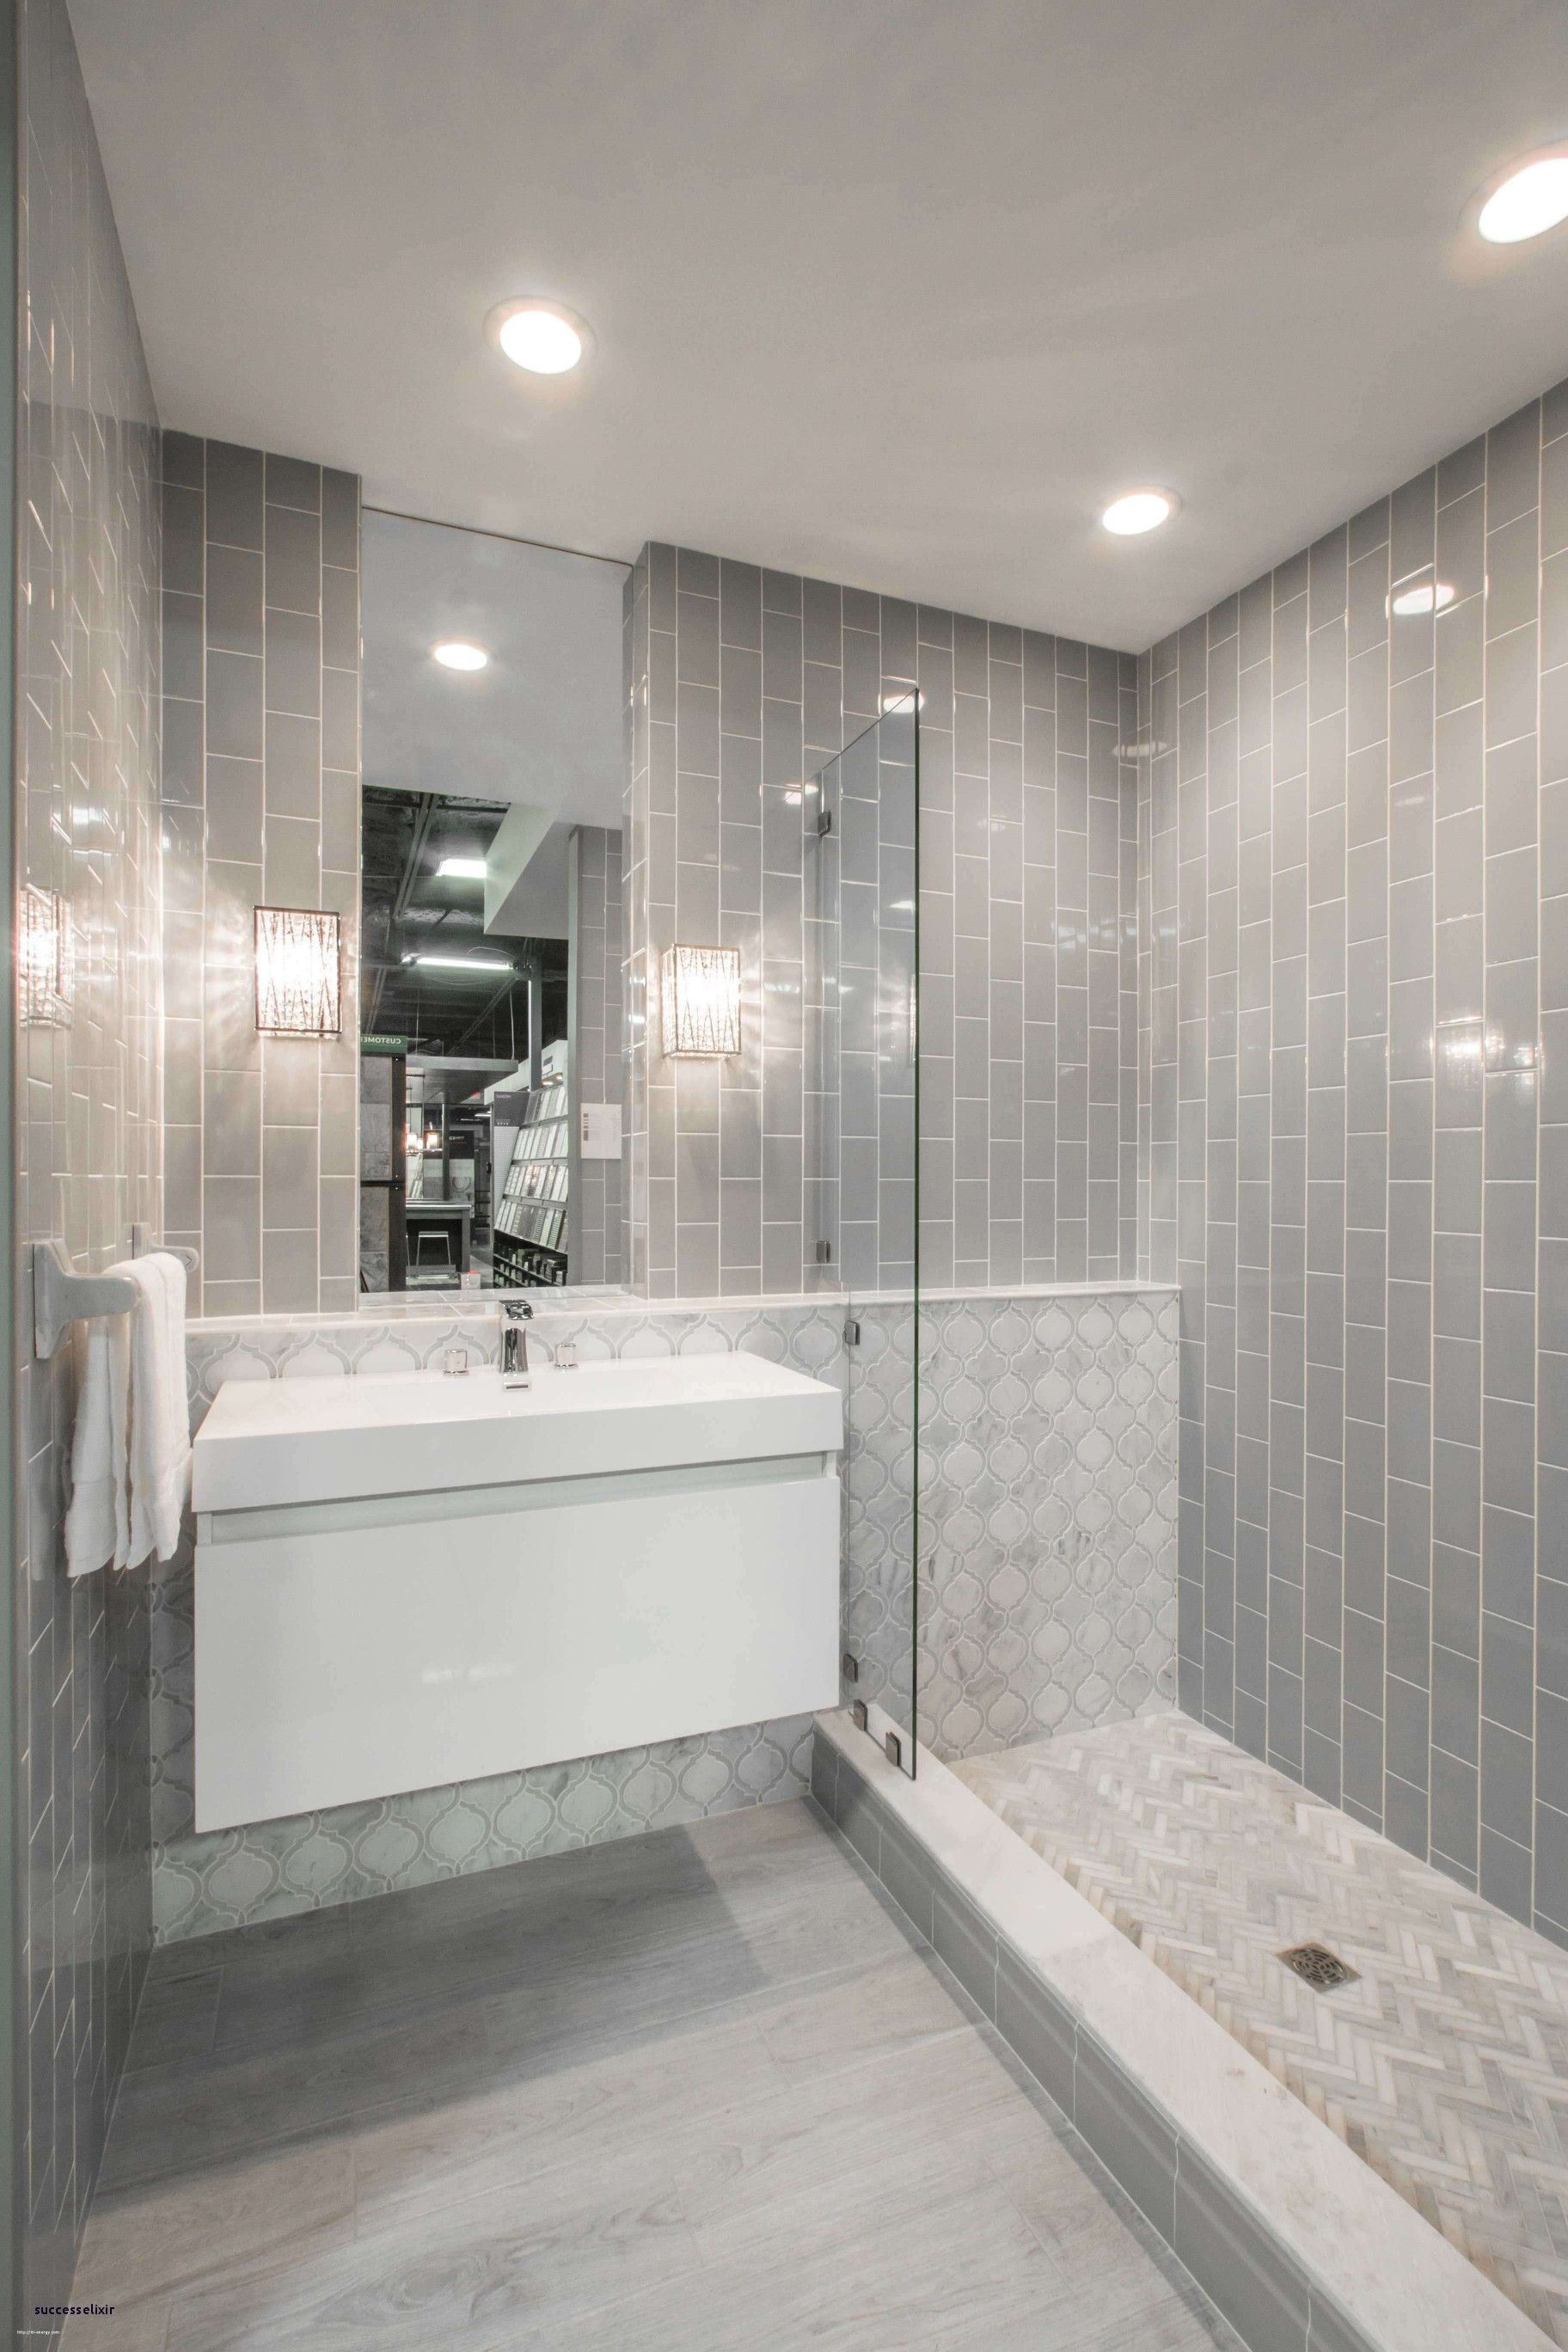 20 Beautiful Stylish Bathroom Ideas Image